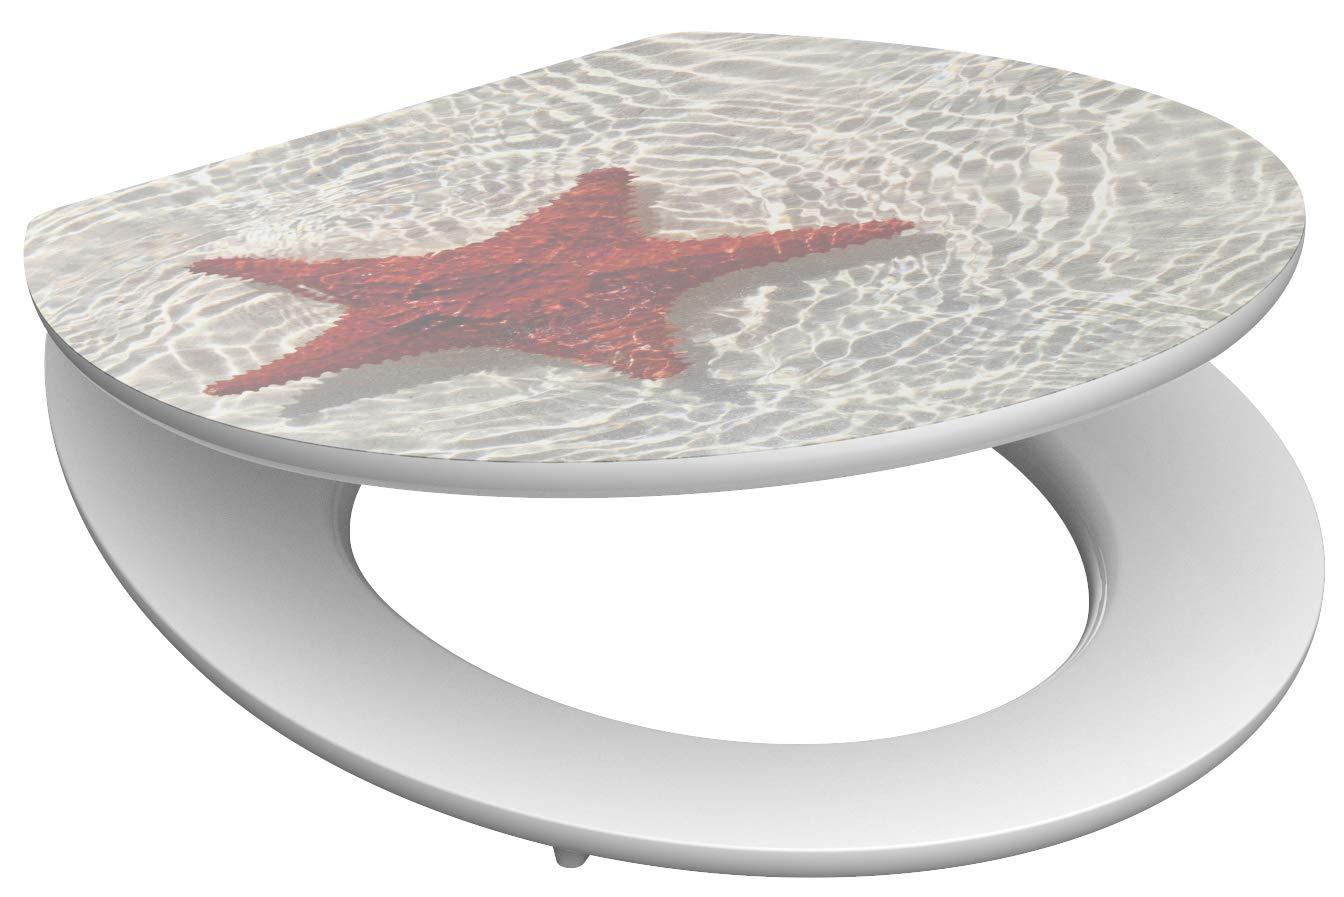 Eisl / Schuette Wc sedátko Red Starfish MDF HG se zpomalovacím mechanismem SOFT-CLOSE 80541RedStarfish